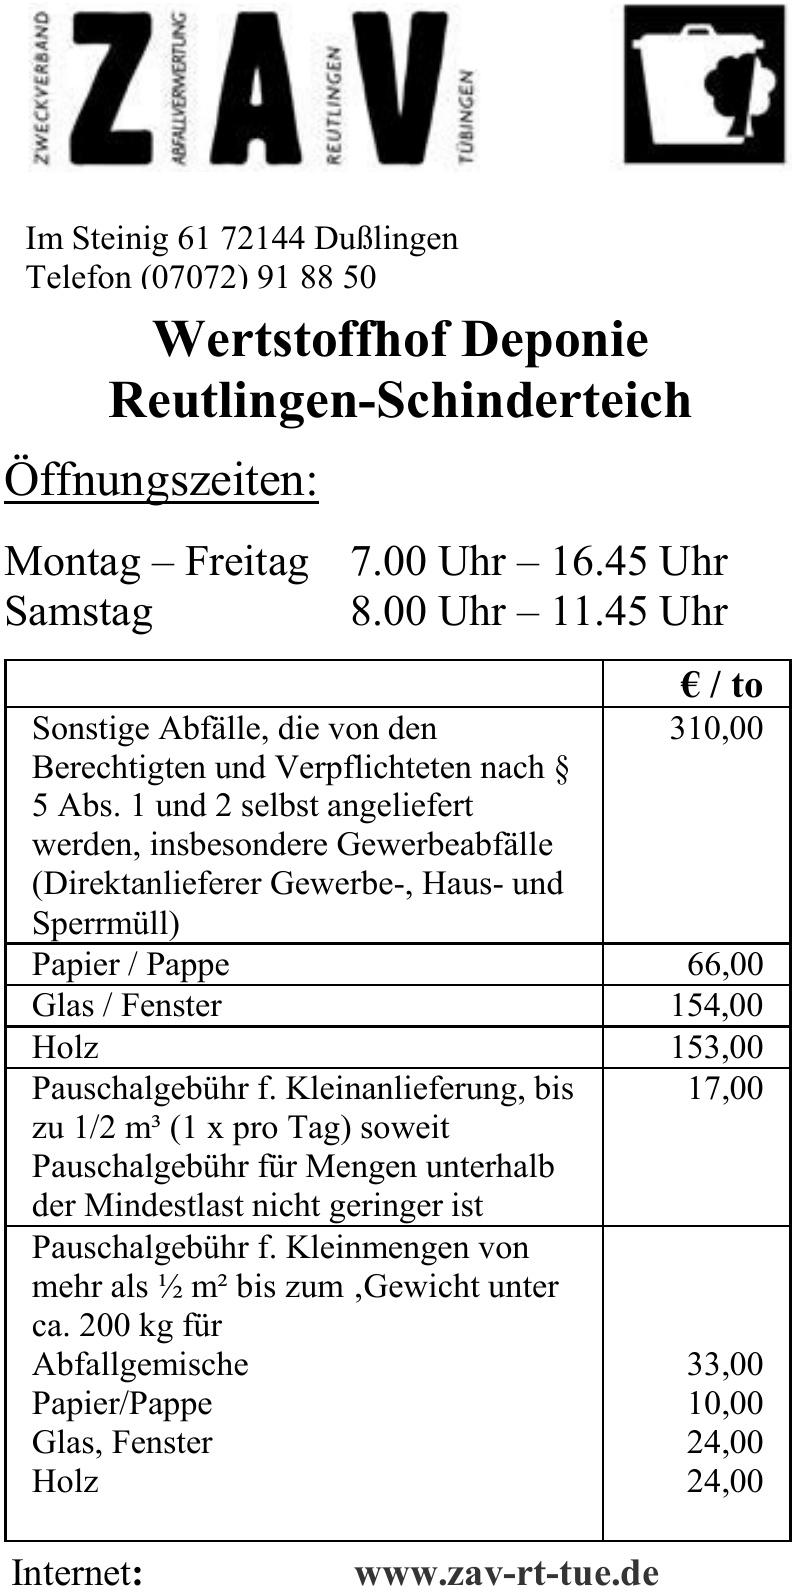 ZAV Zweckverband Abfallverwertung Reutlingen Tübingen